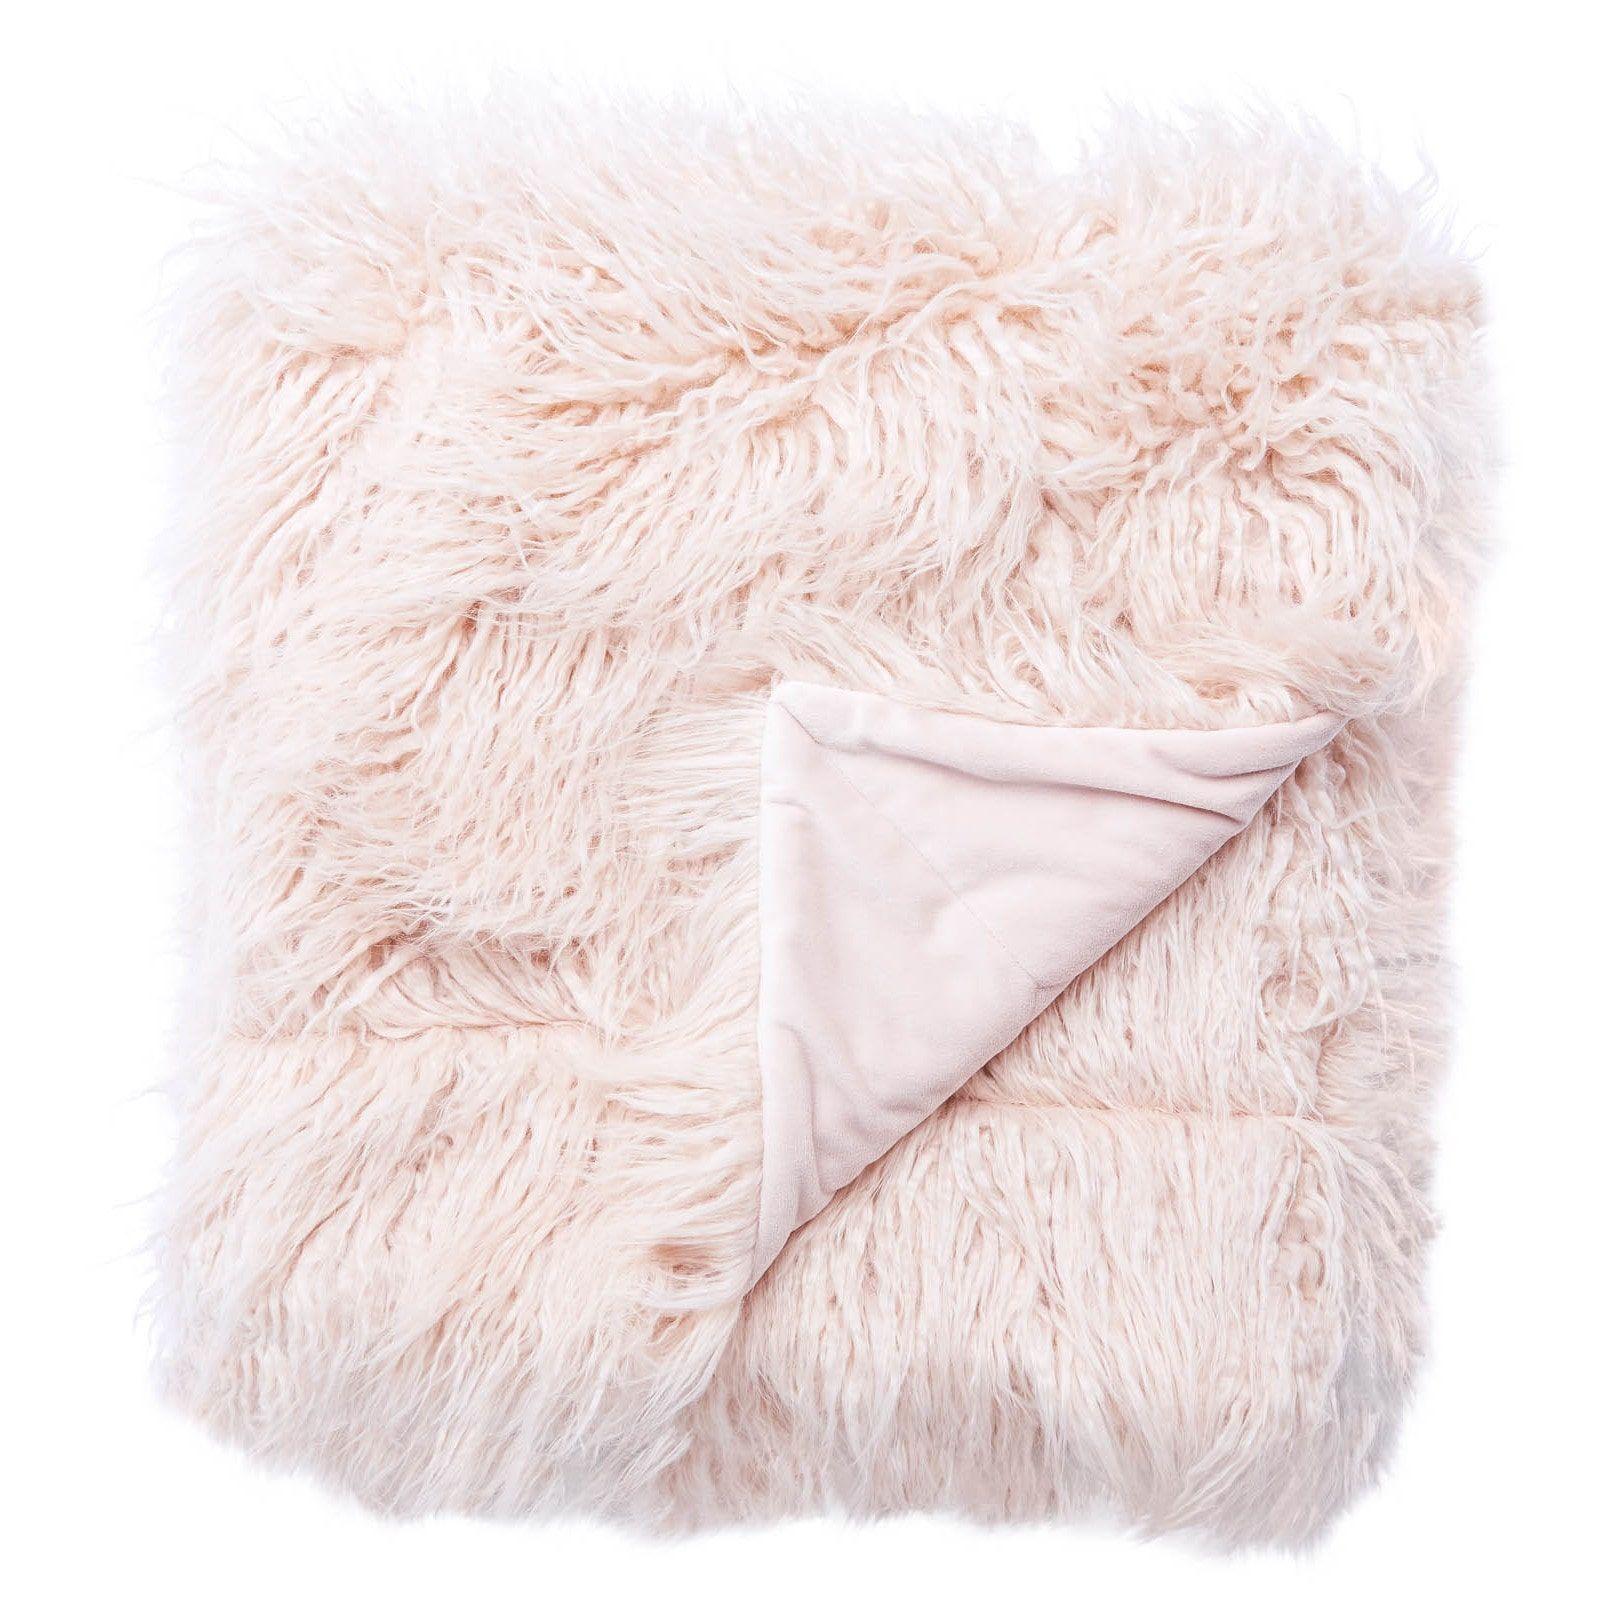 Blush Pink Throw Blanket Adorable Jaipur Allura Faux Fur Throw  Products  Pinterest  Pink Throws Design Inspiration